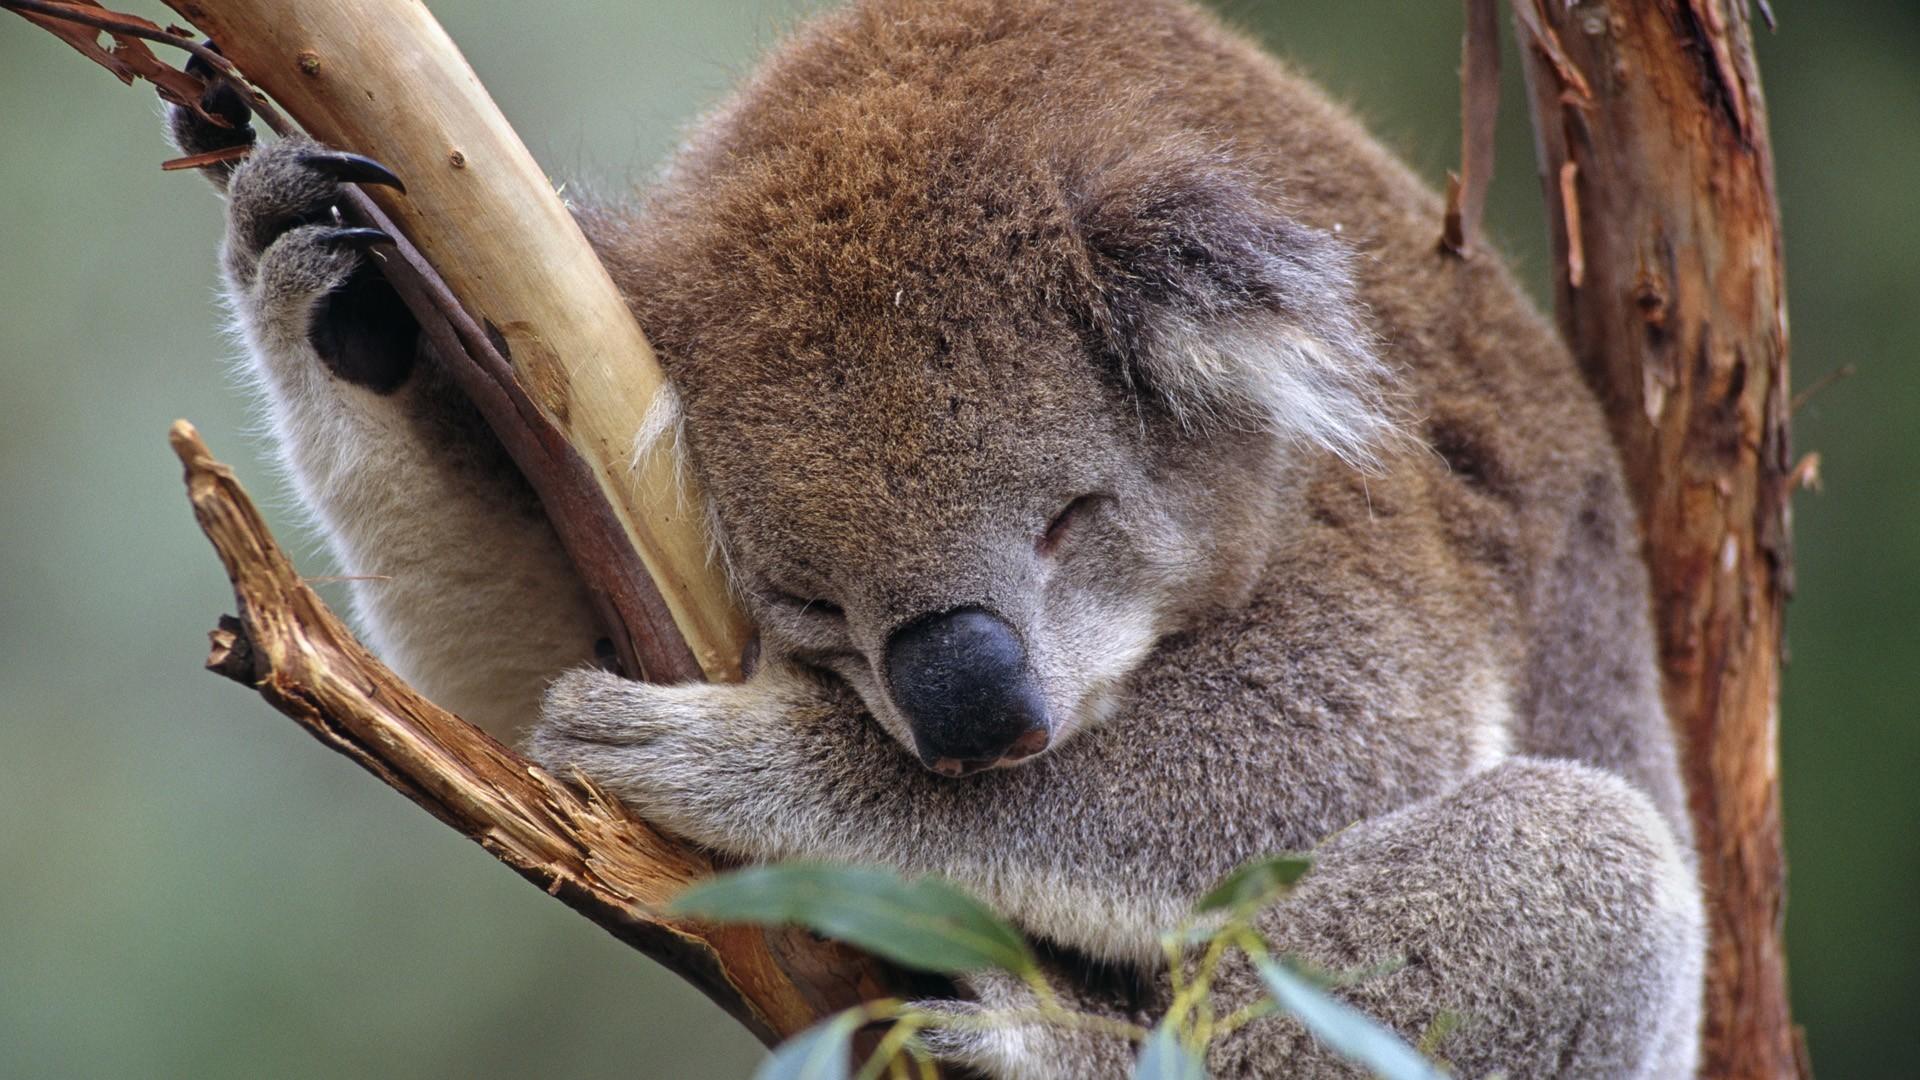 Koala Cute Overload!